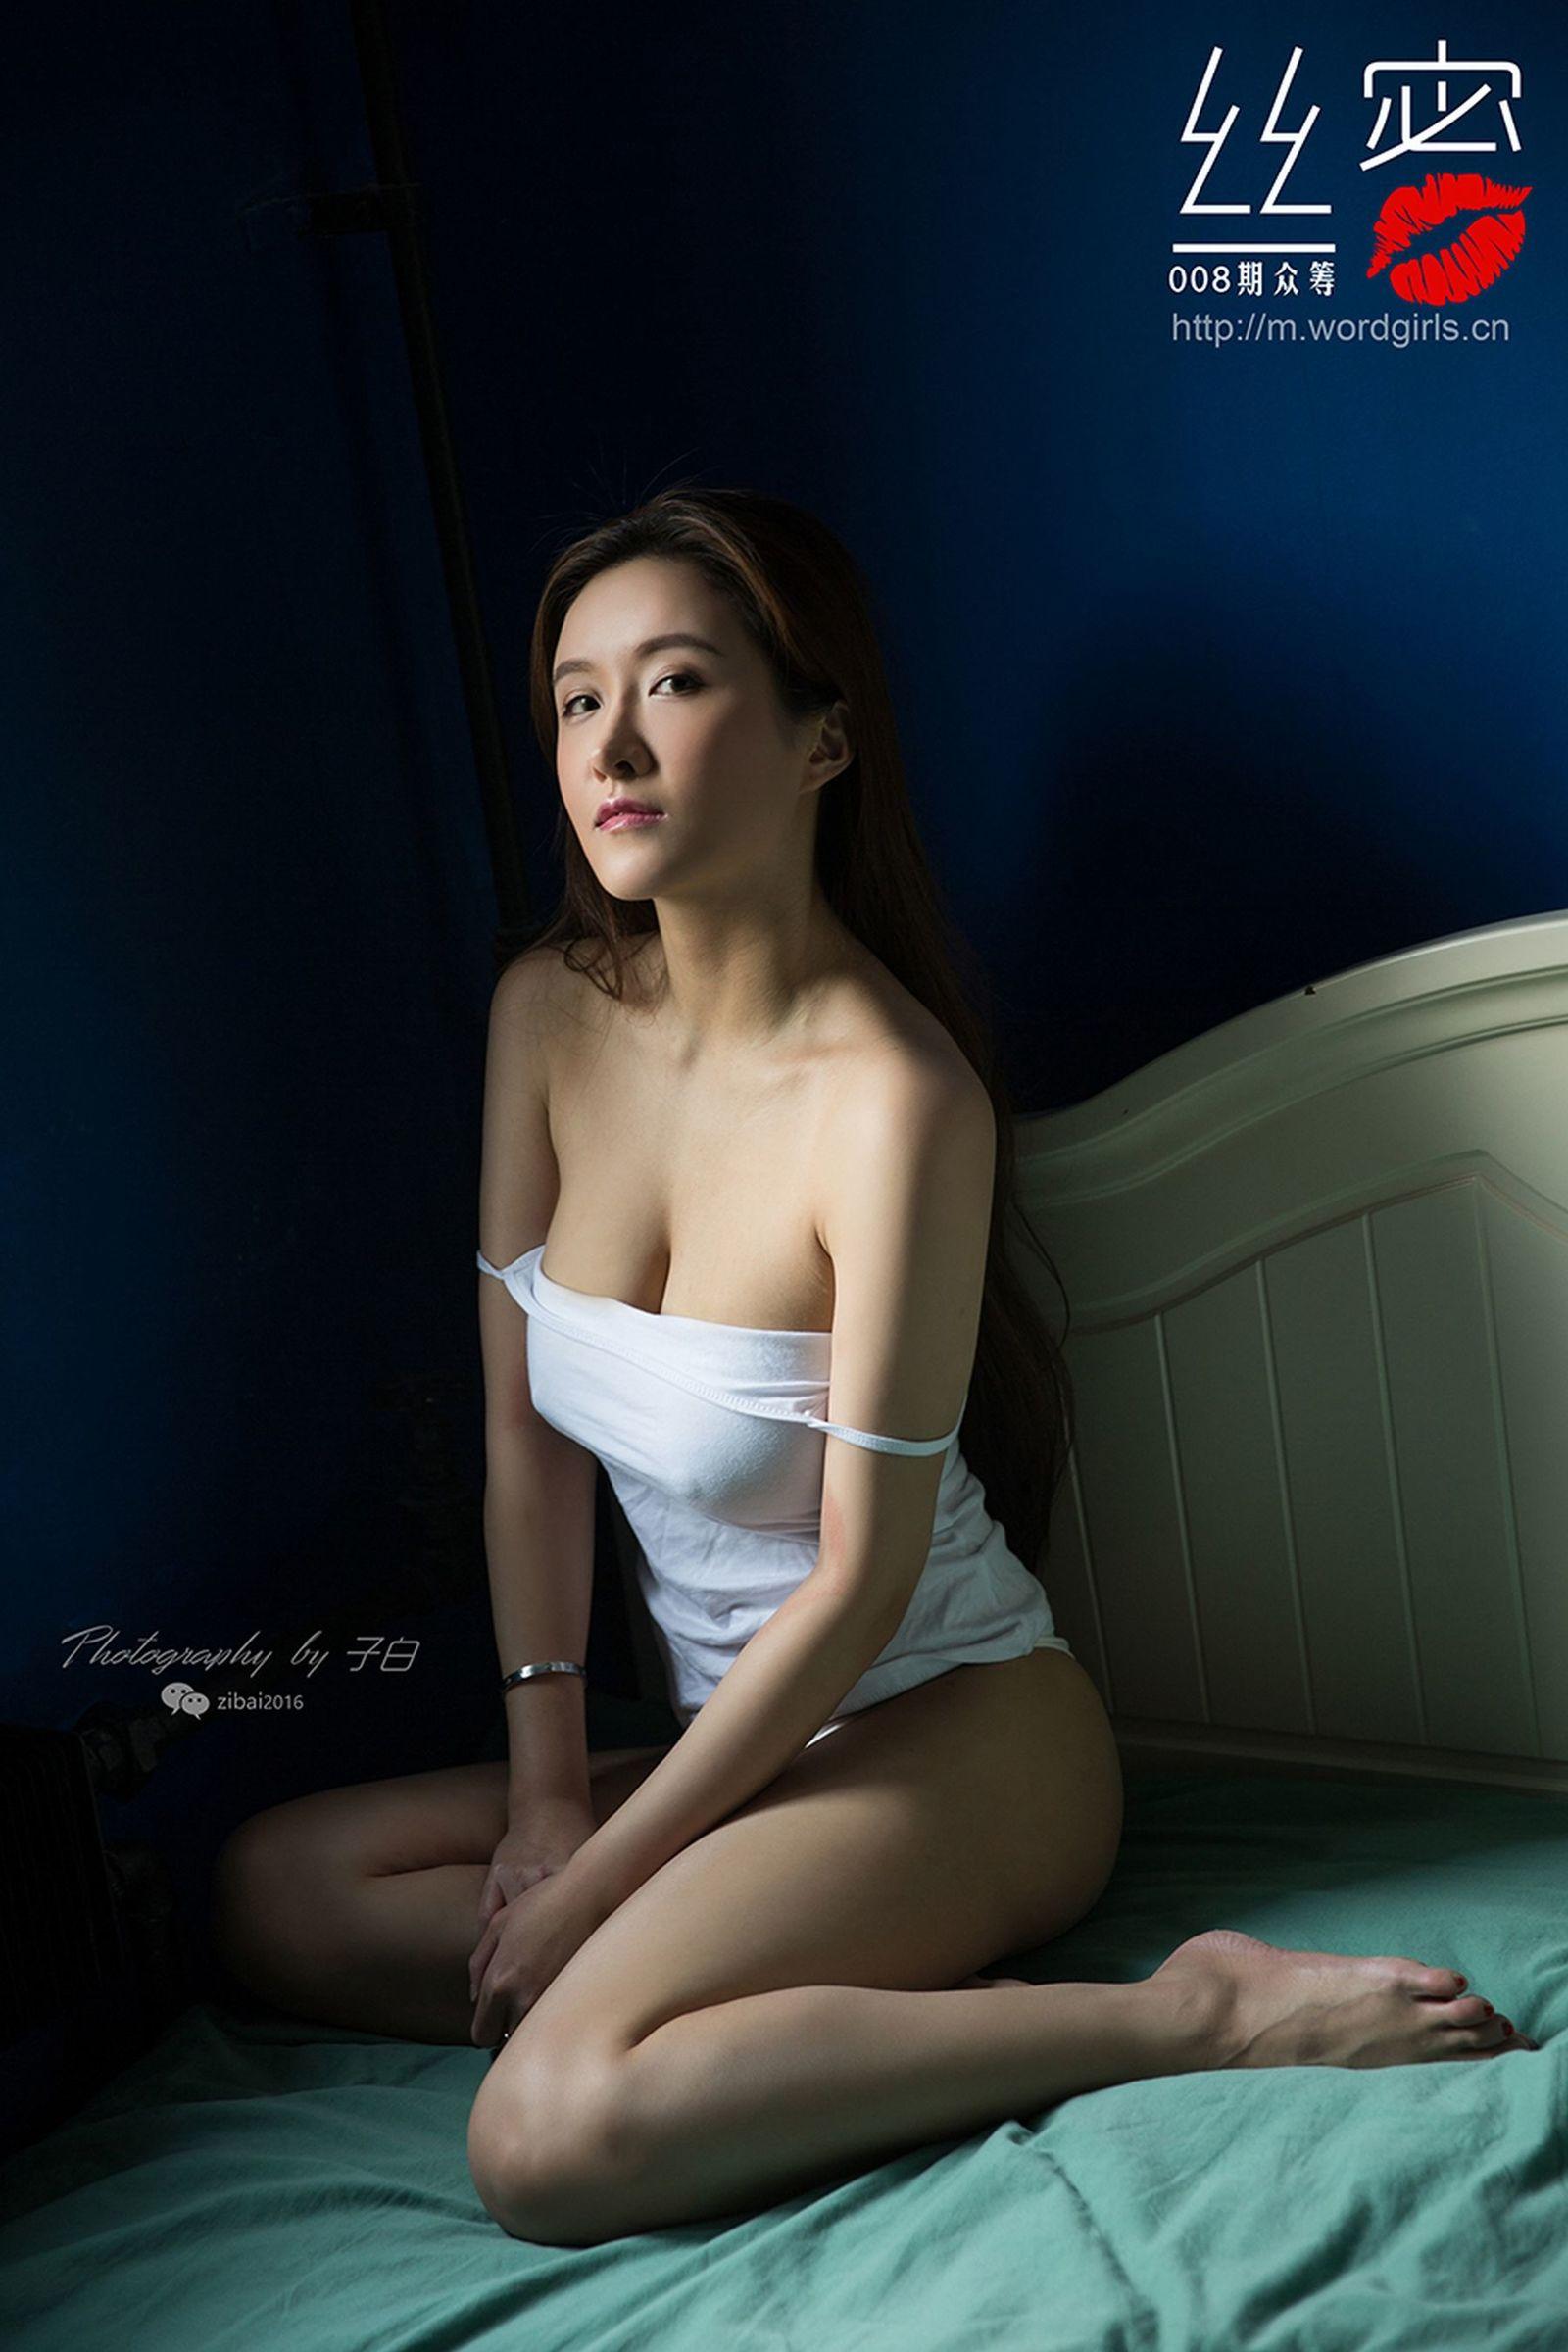 [TouTiao头条女神] JennyR - 008期丝蜜众筹回报之情绪人像[9P]